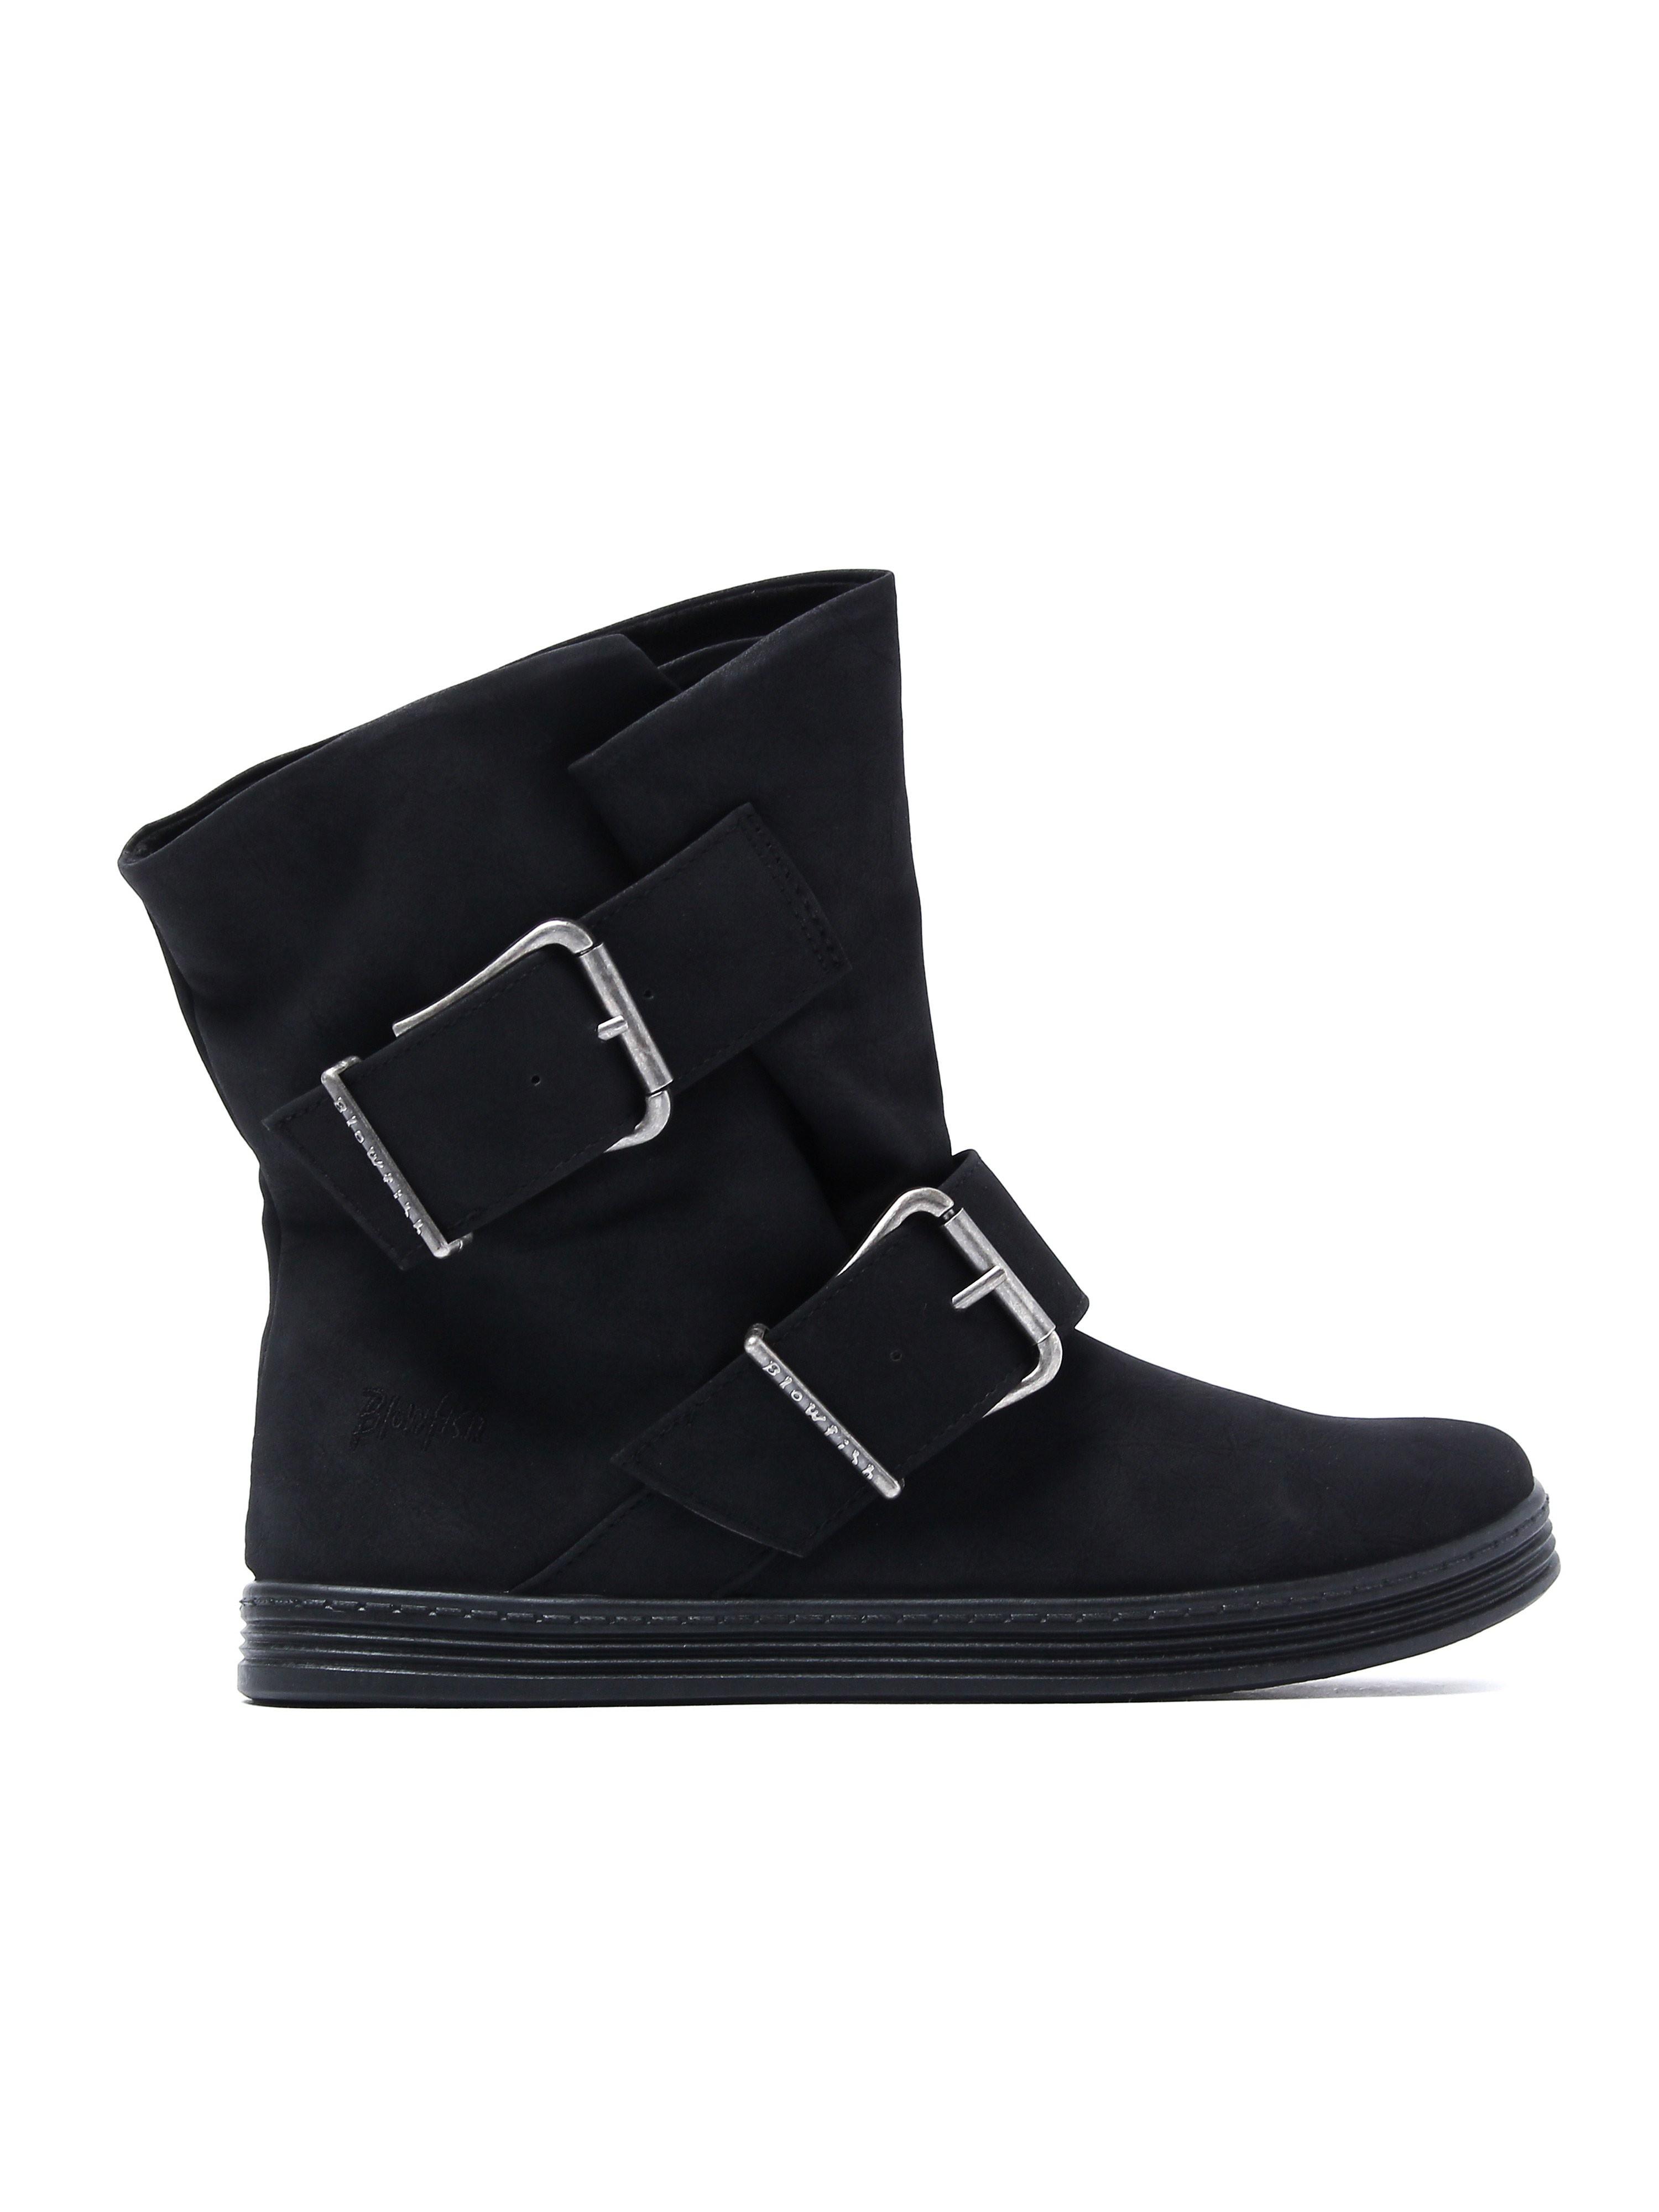 Blowfish Women's Fire Ankle Boots - Black Dallas Suede